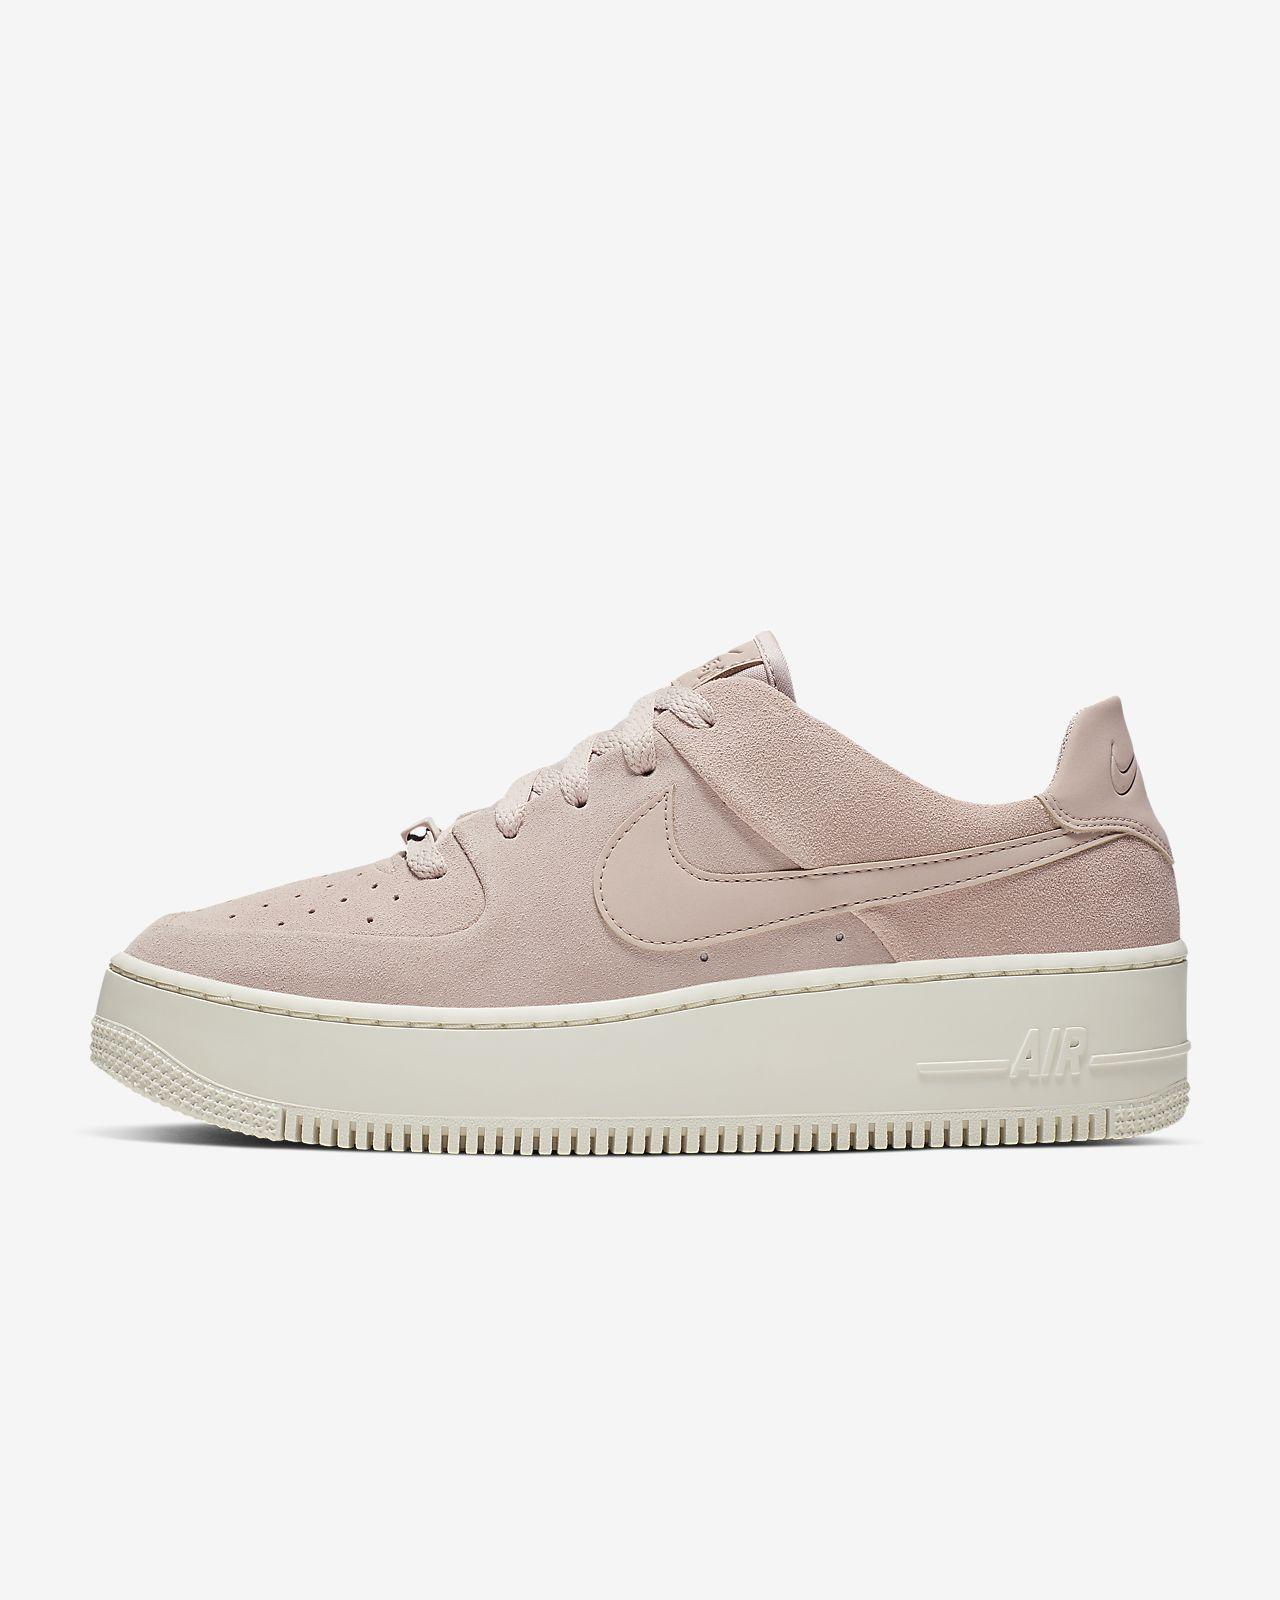 Женские кроссовки Nike Air Force 1 Sage Low. Nike.com RU a85332e1e4f